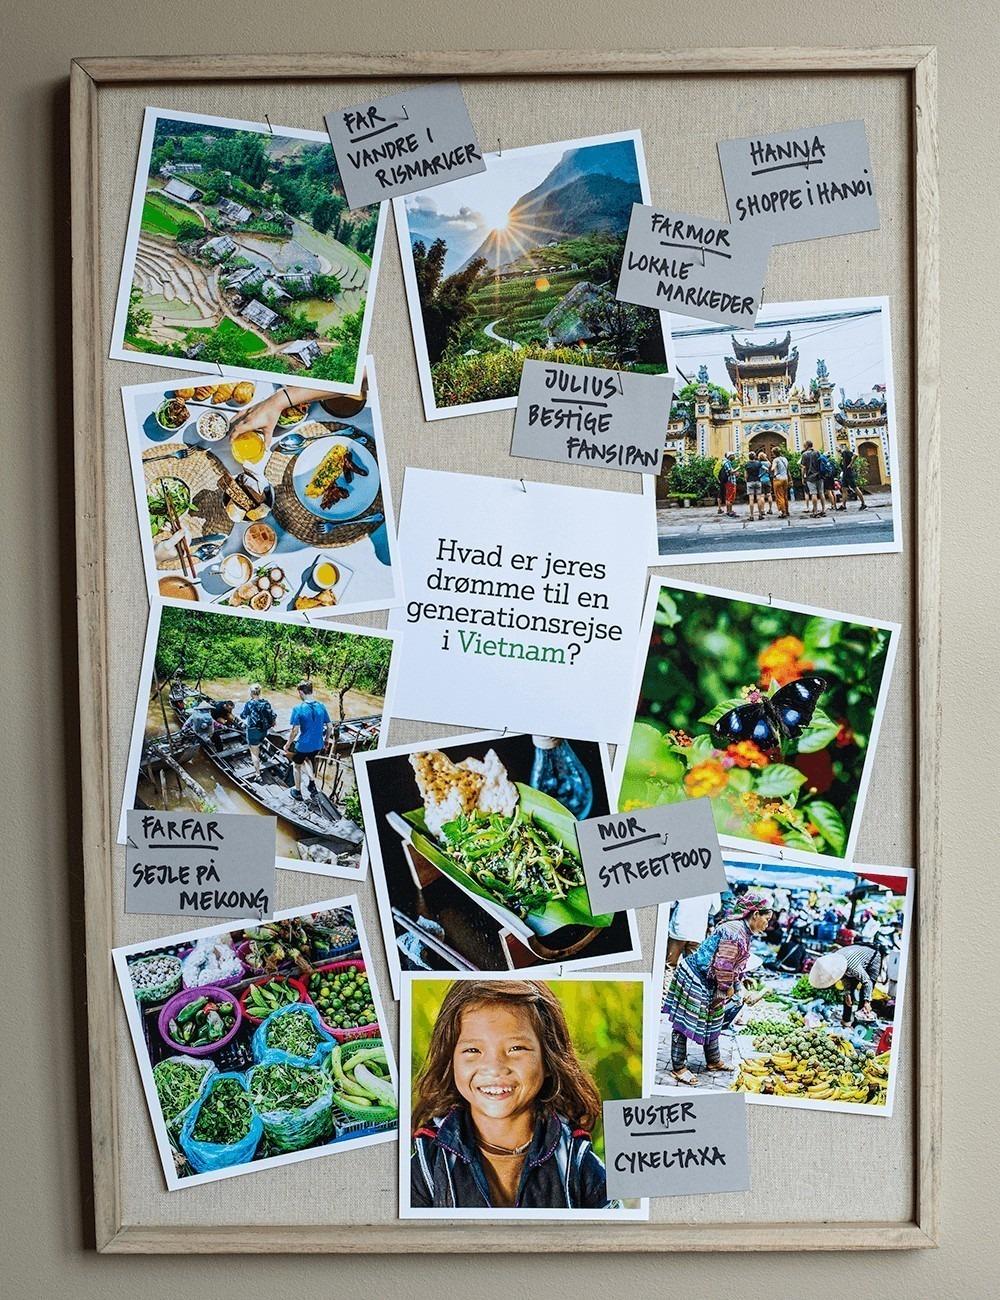 Vietnam by Topas - Børsen annonce - web